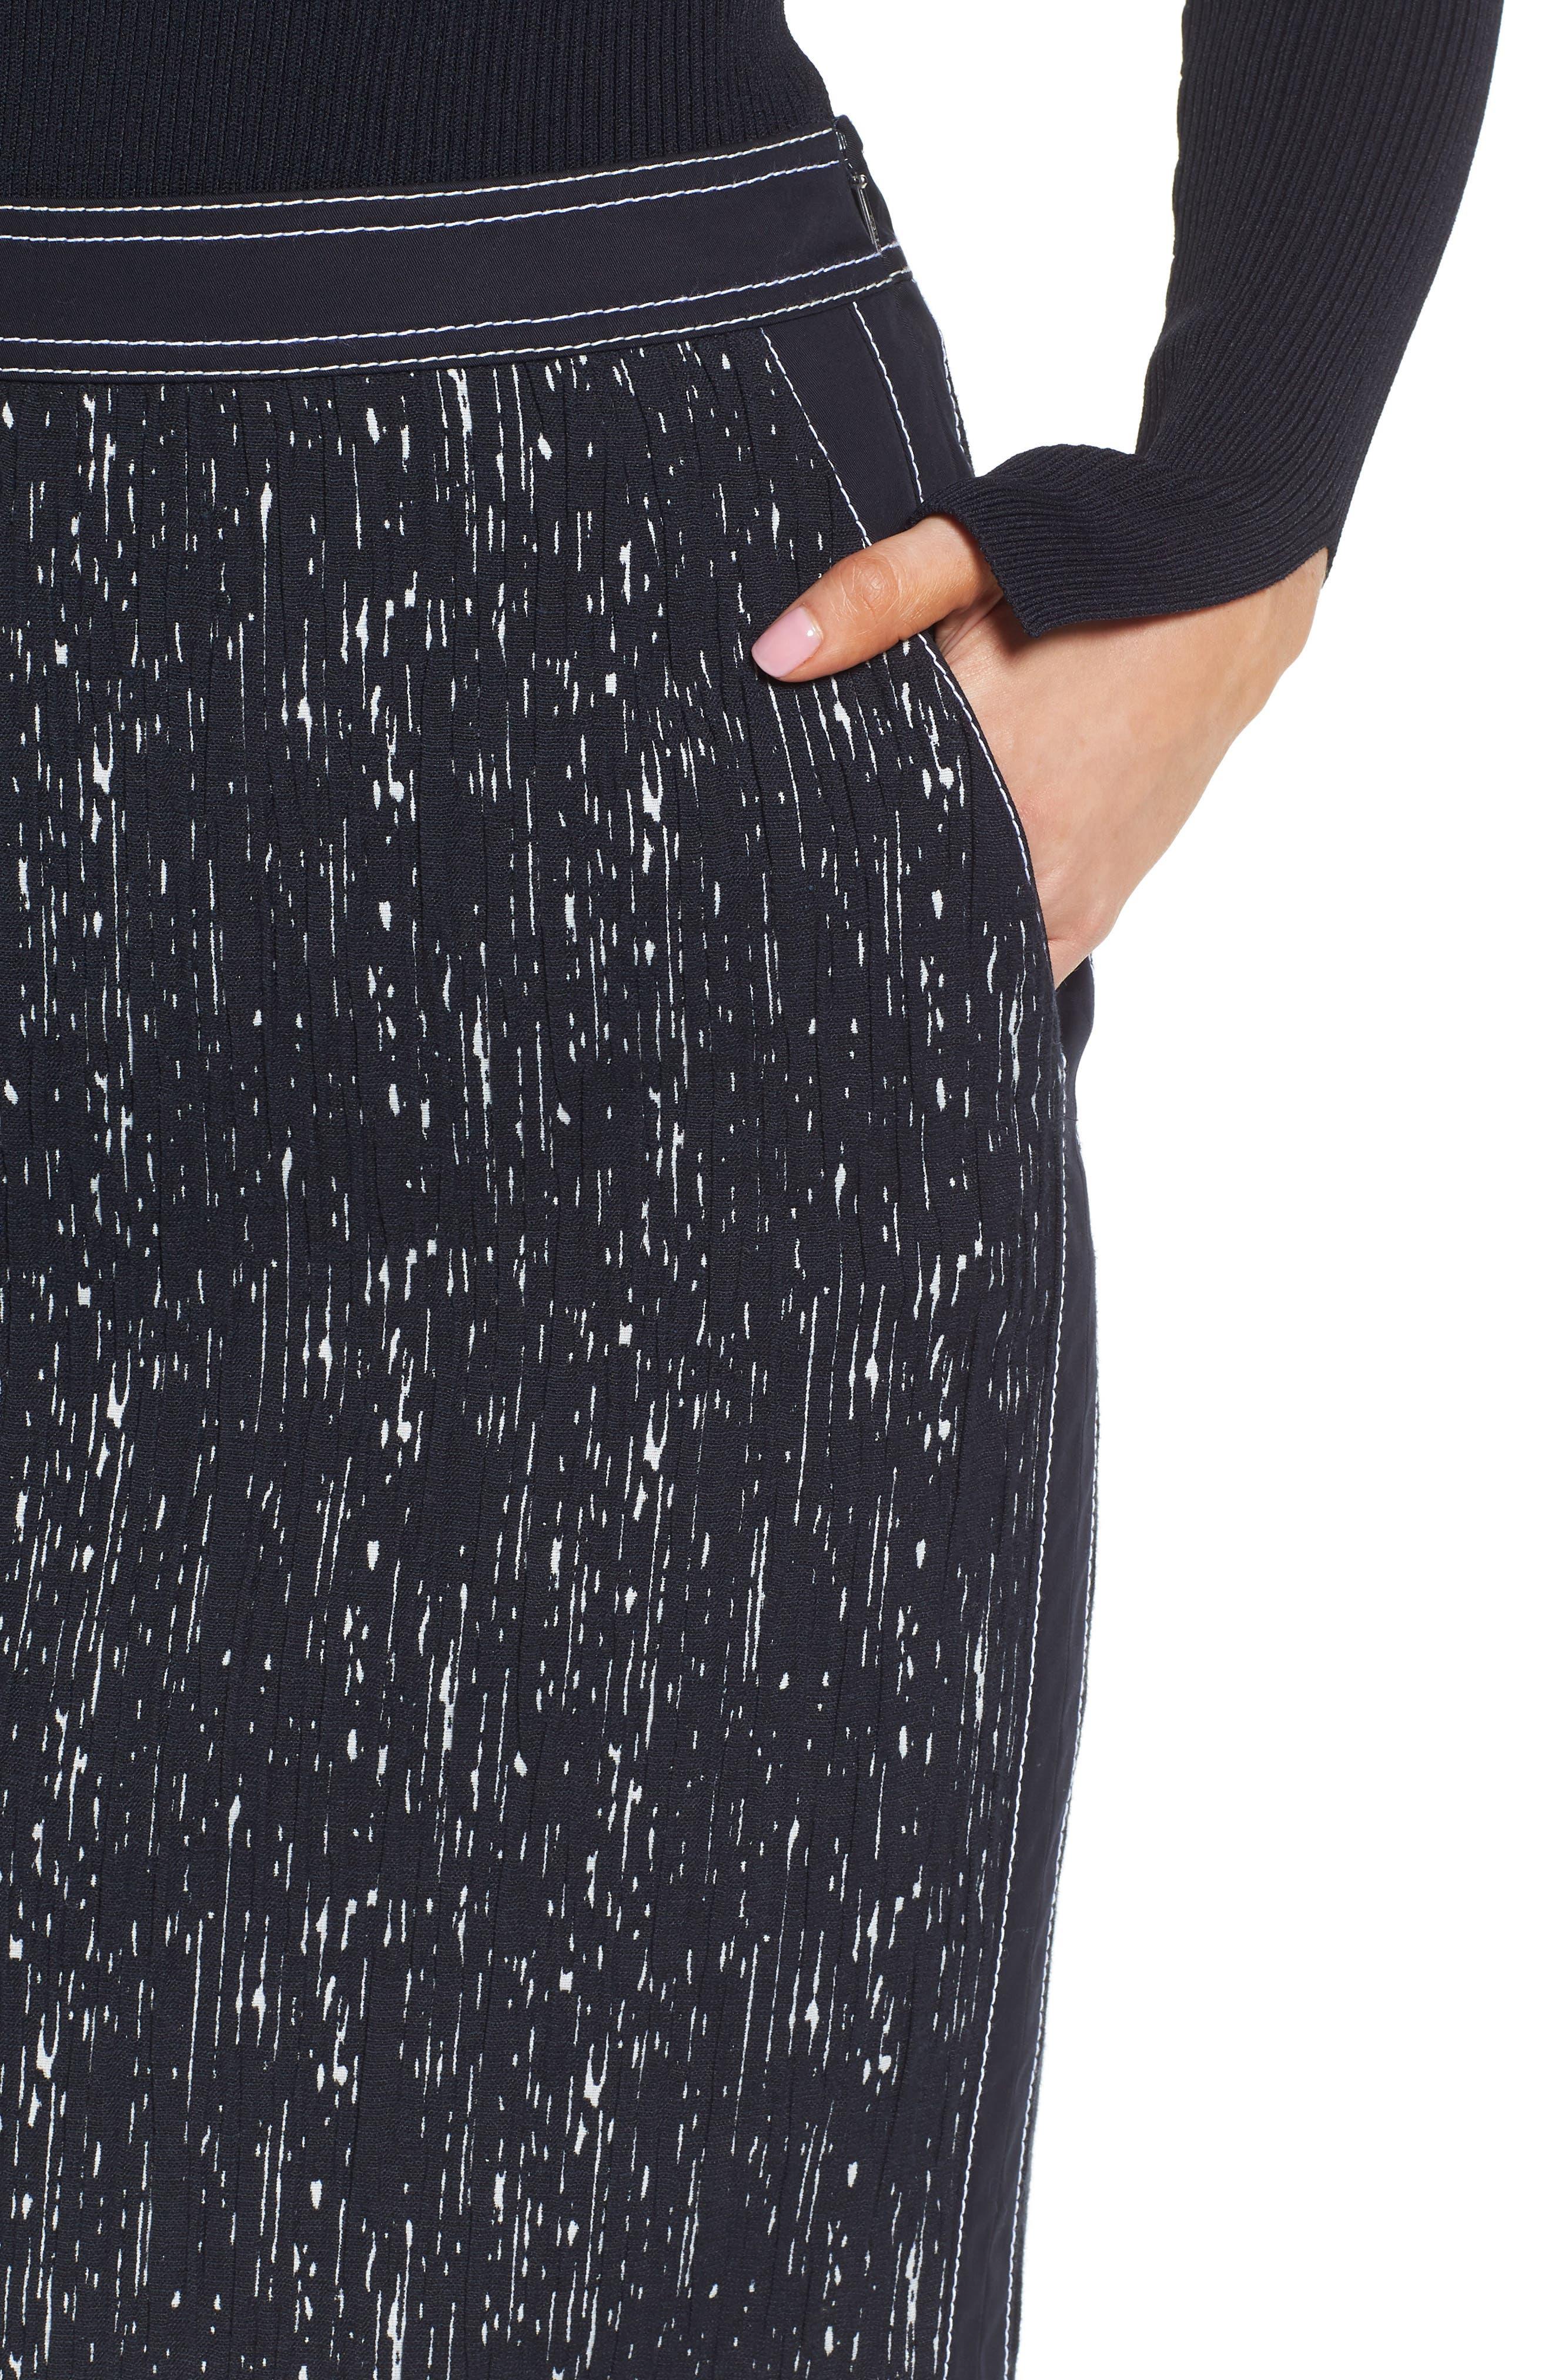 Veleara Pencil Skirt,                             Alternate thumbnail 4, color,